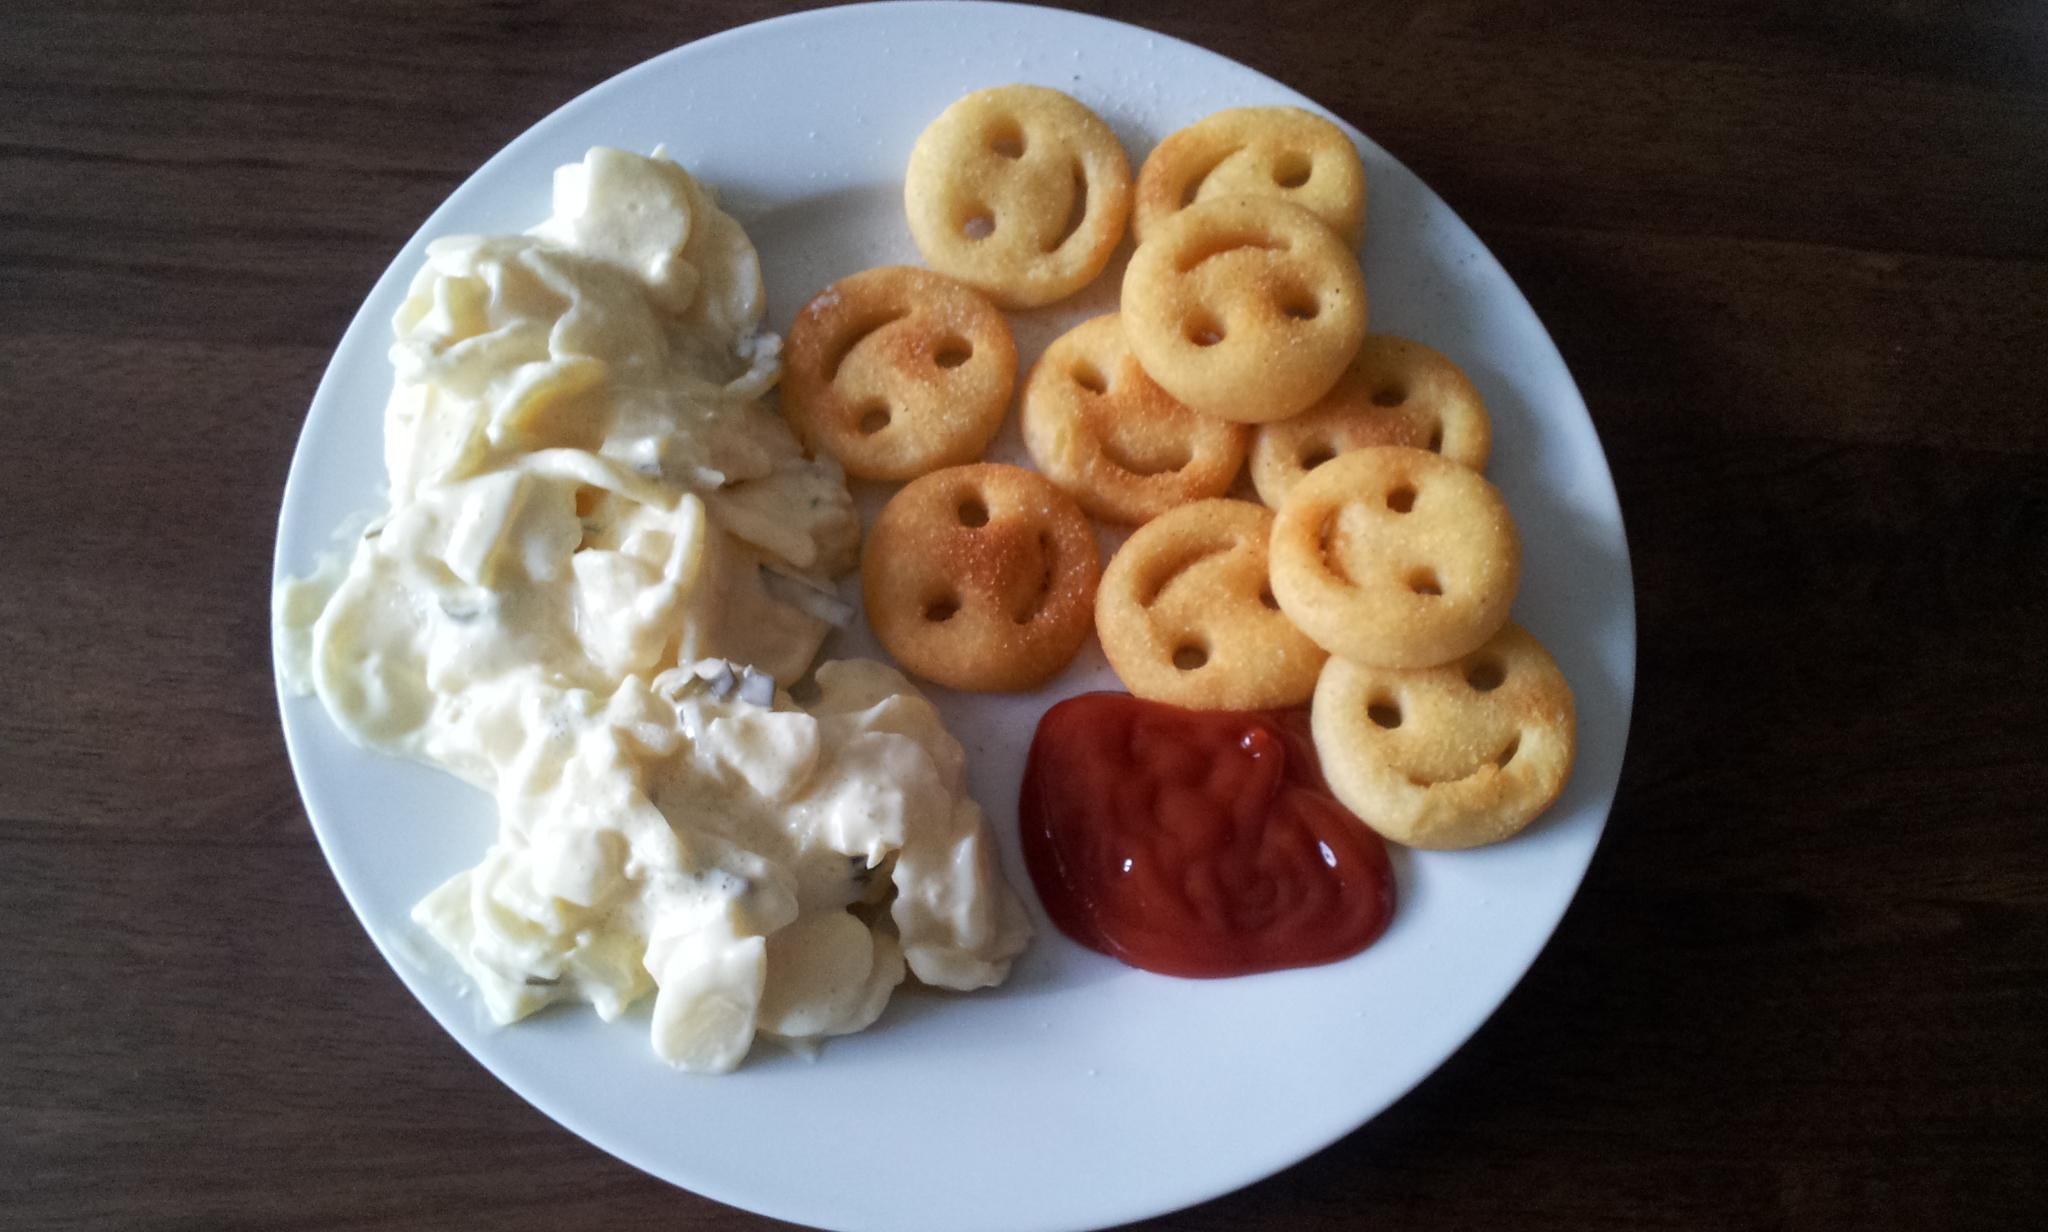 https://foodloader.net/Holz_2011-14-08_Kartoffelsalat_mit_Smiles.jpg